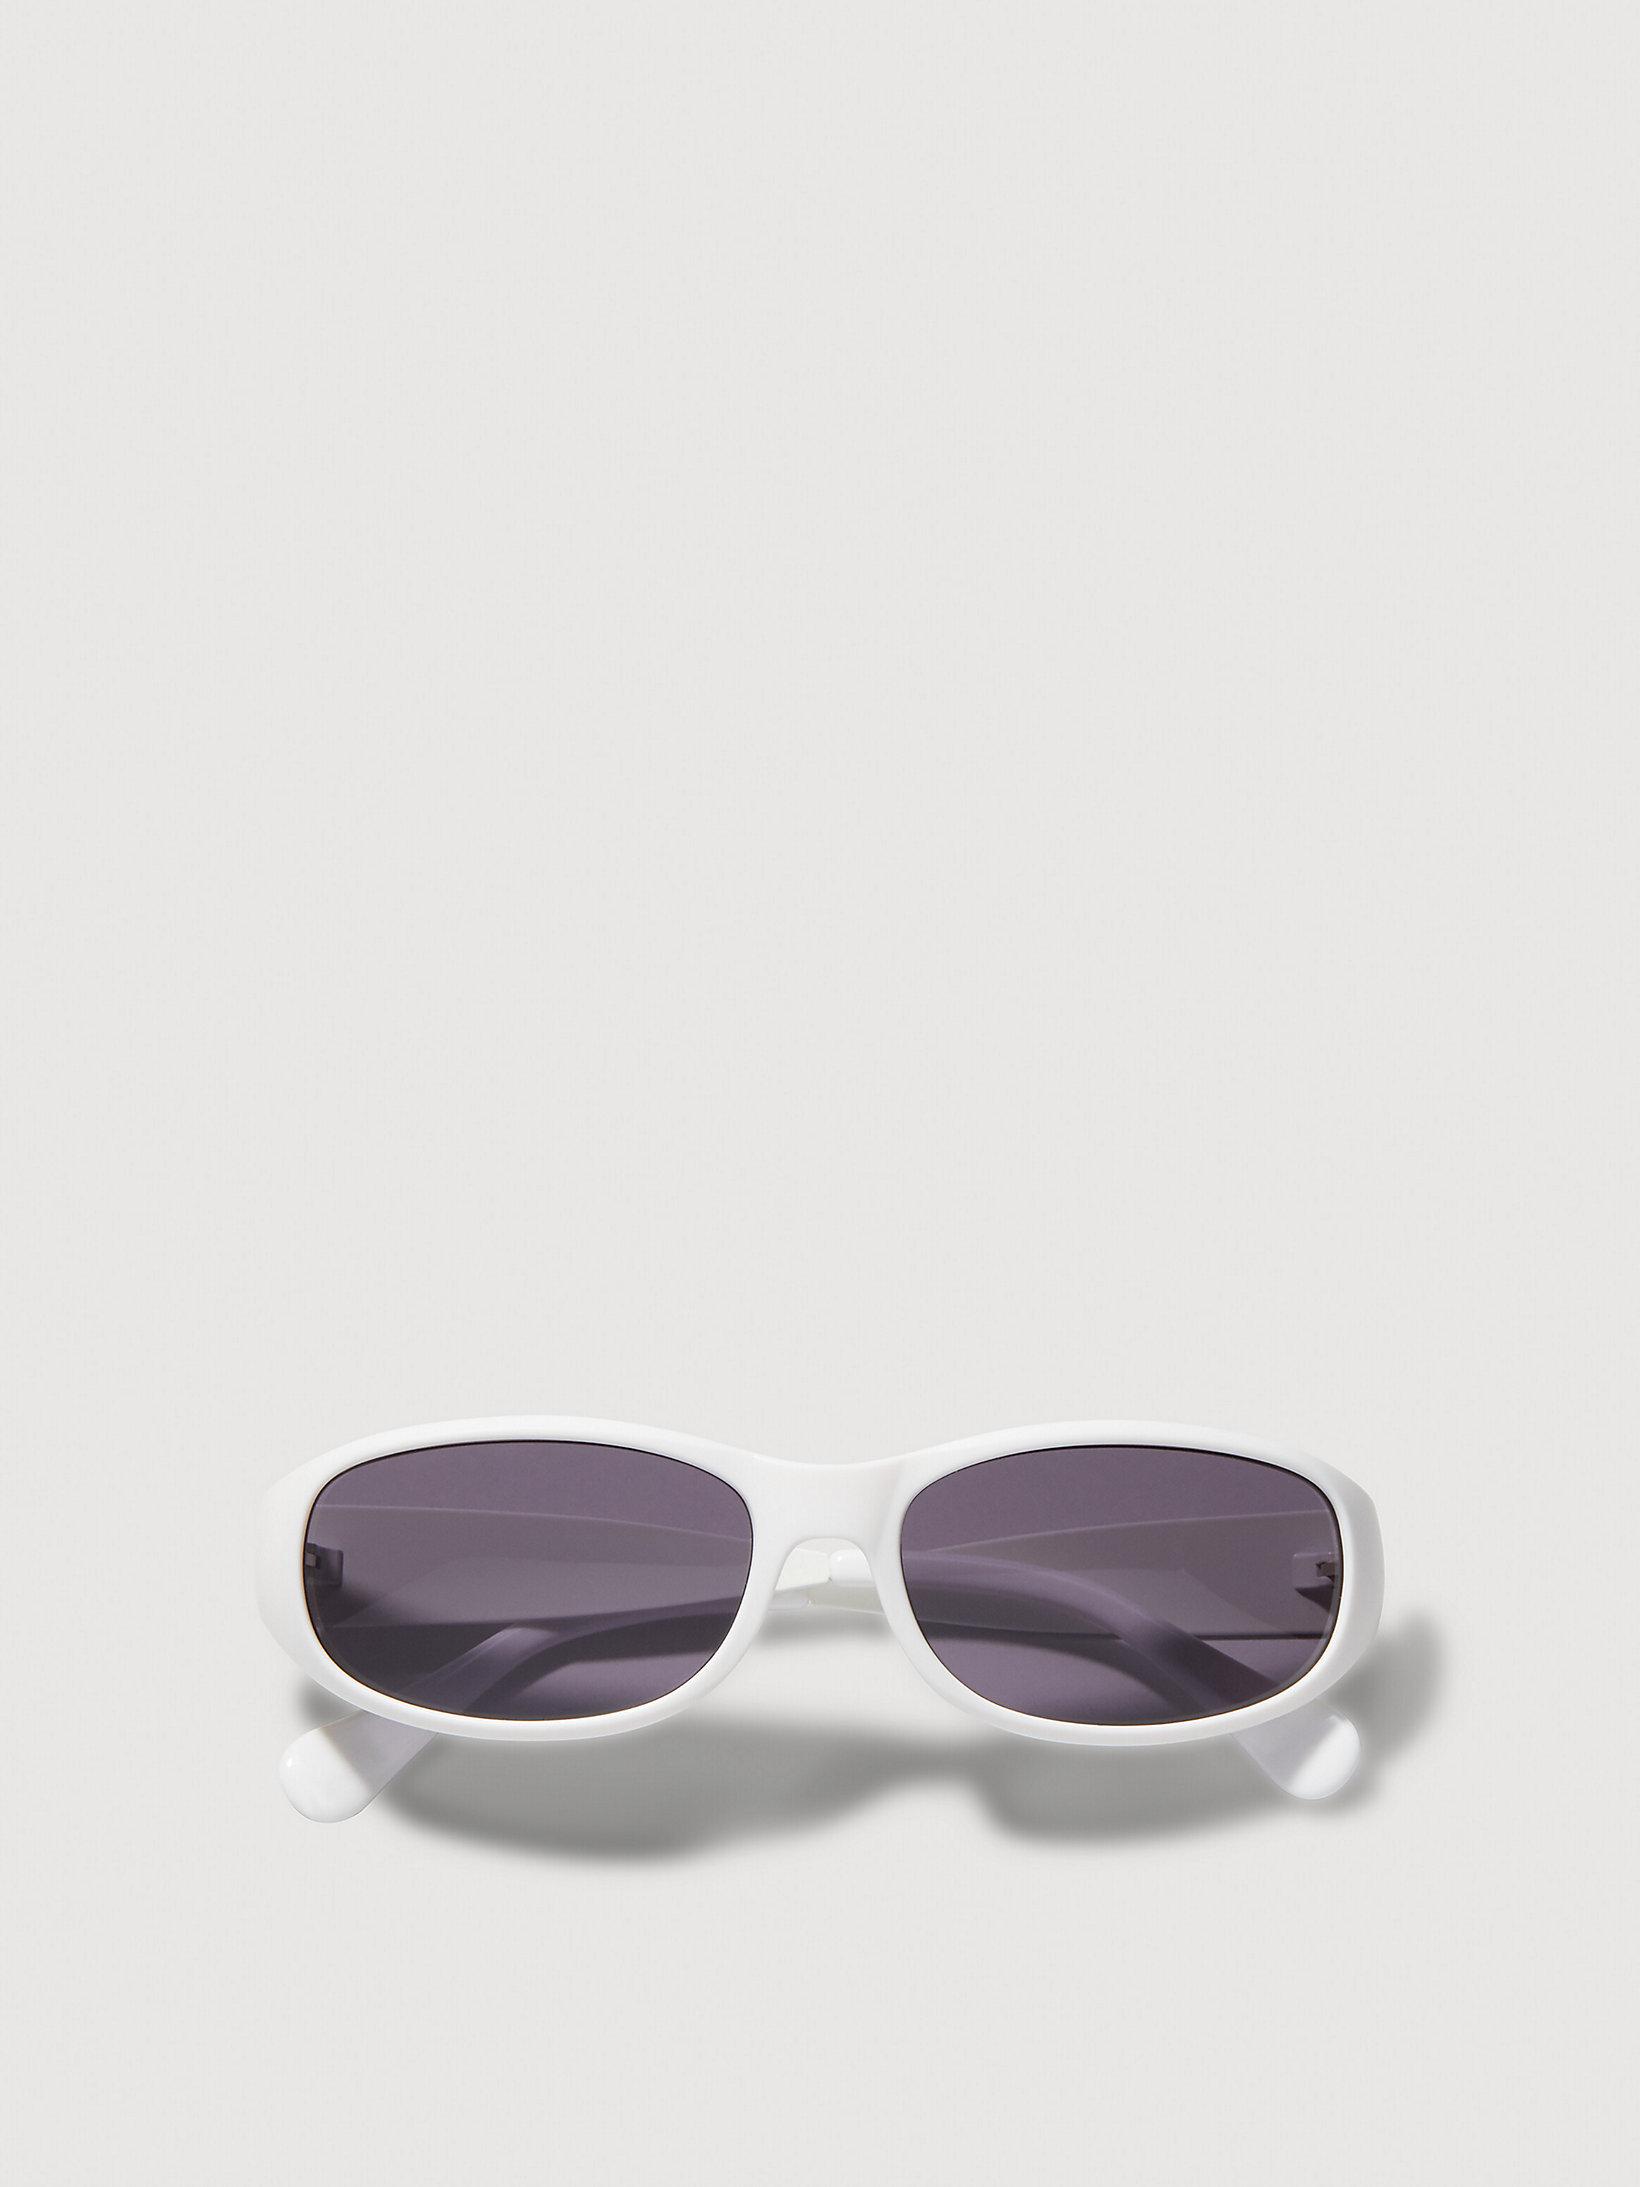 UNISEX OVAL SUNGLASSES by Calvin Klein, available on calvinklein.com for EUR159.9 Elsa Hosk Sunglasses Exact Product